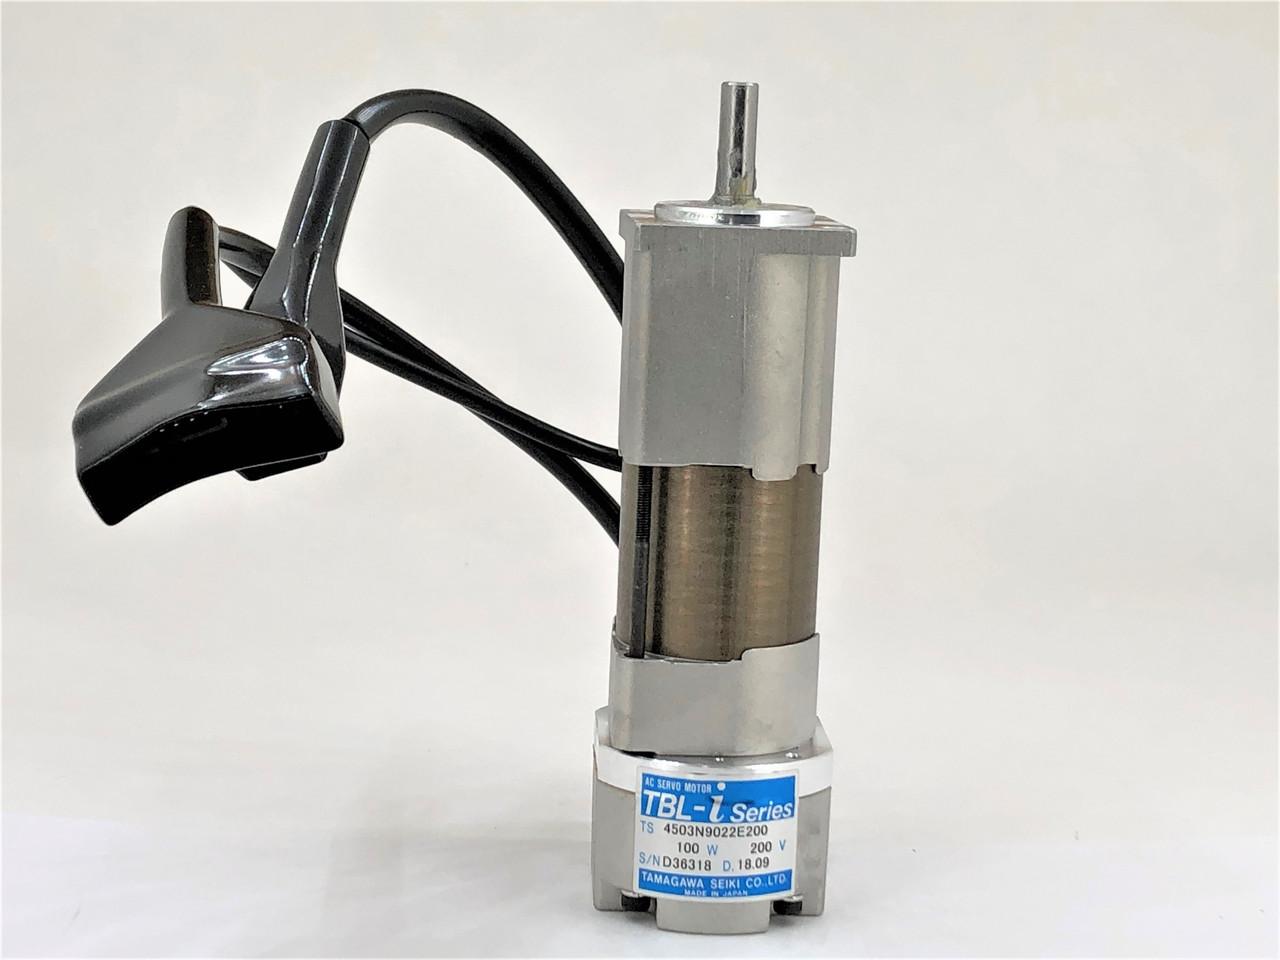 Servo Motor wBrake 100 Watt 4-Pin Yamaha Robot 200mm Lead